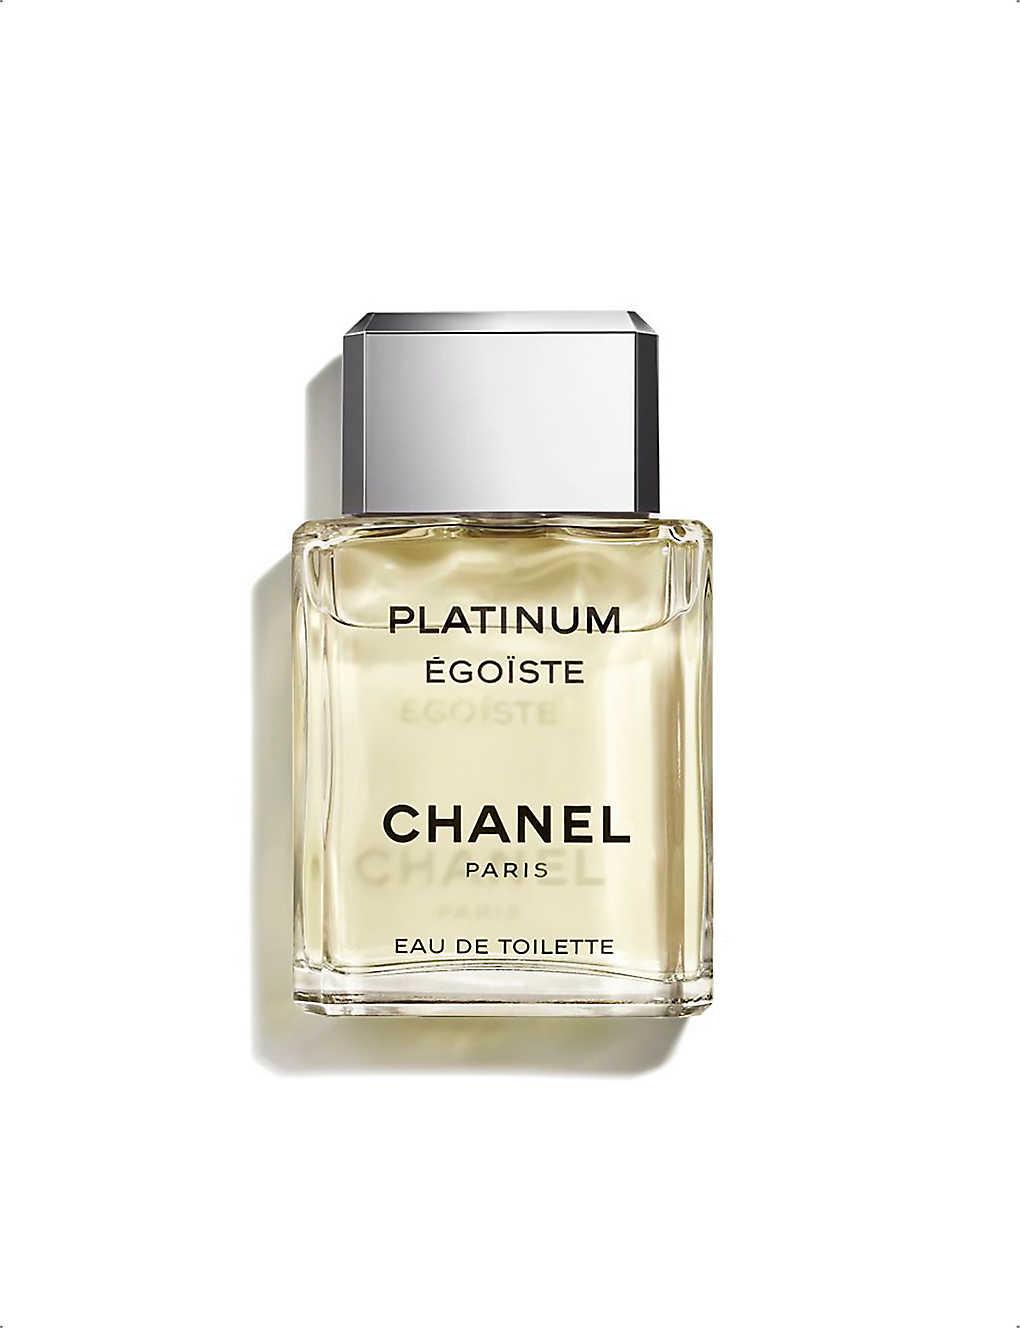 Chanel Platinum égoïste Eau De Toilette Spray 100ml Selfridgescom